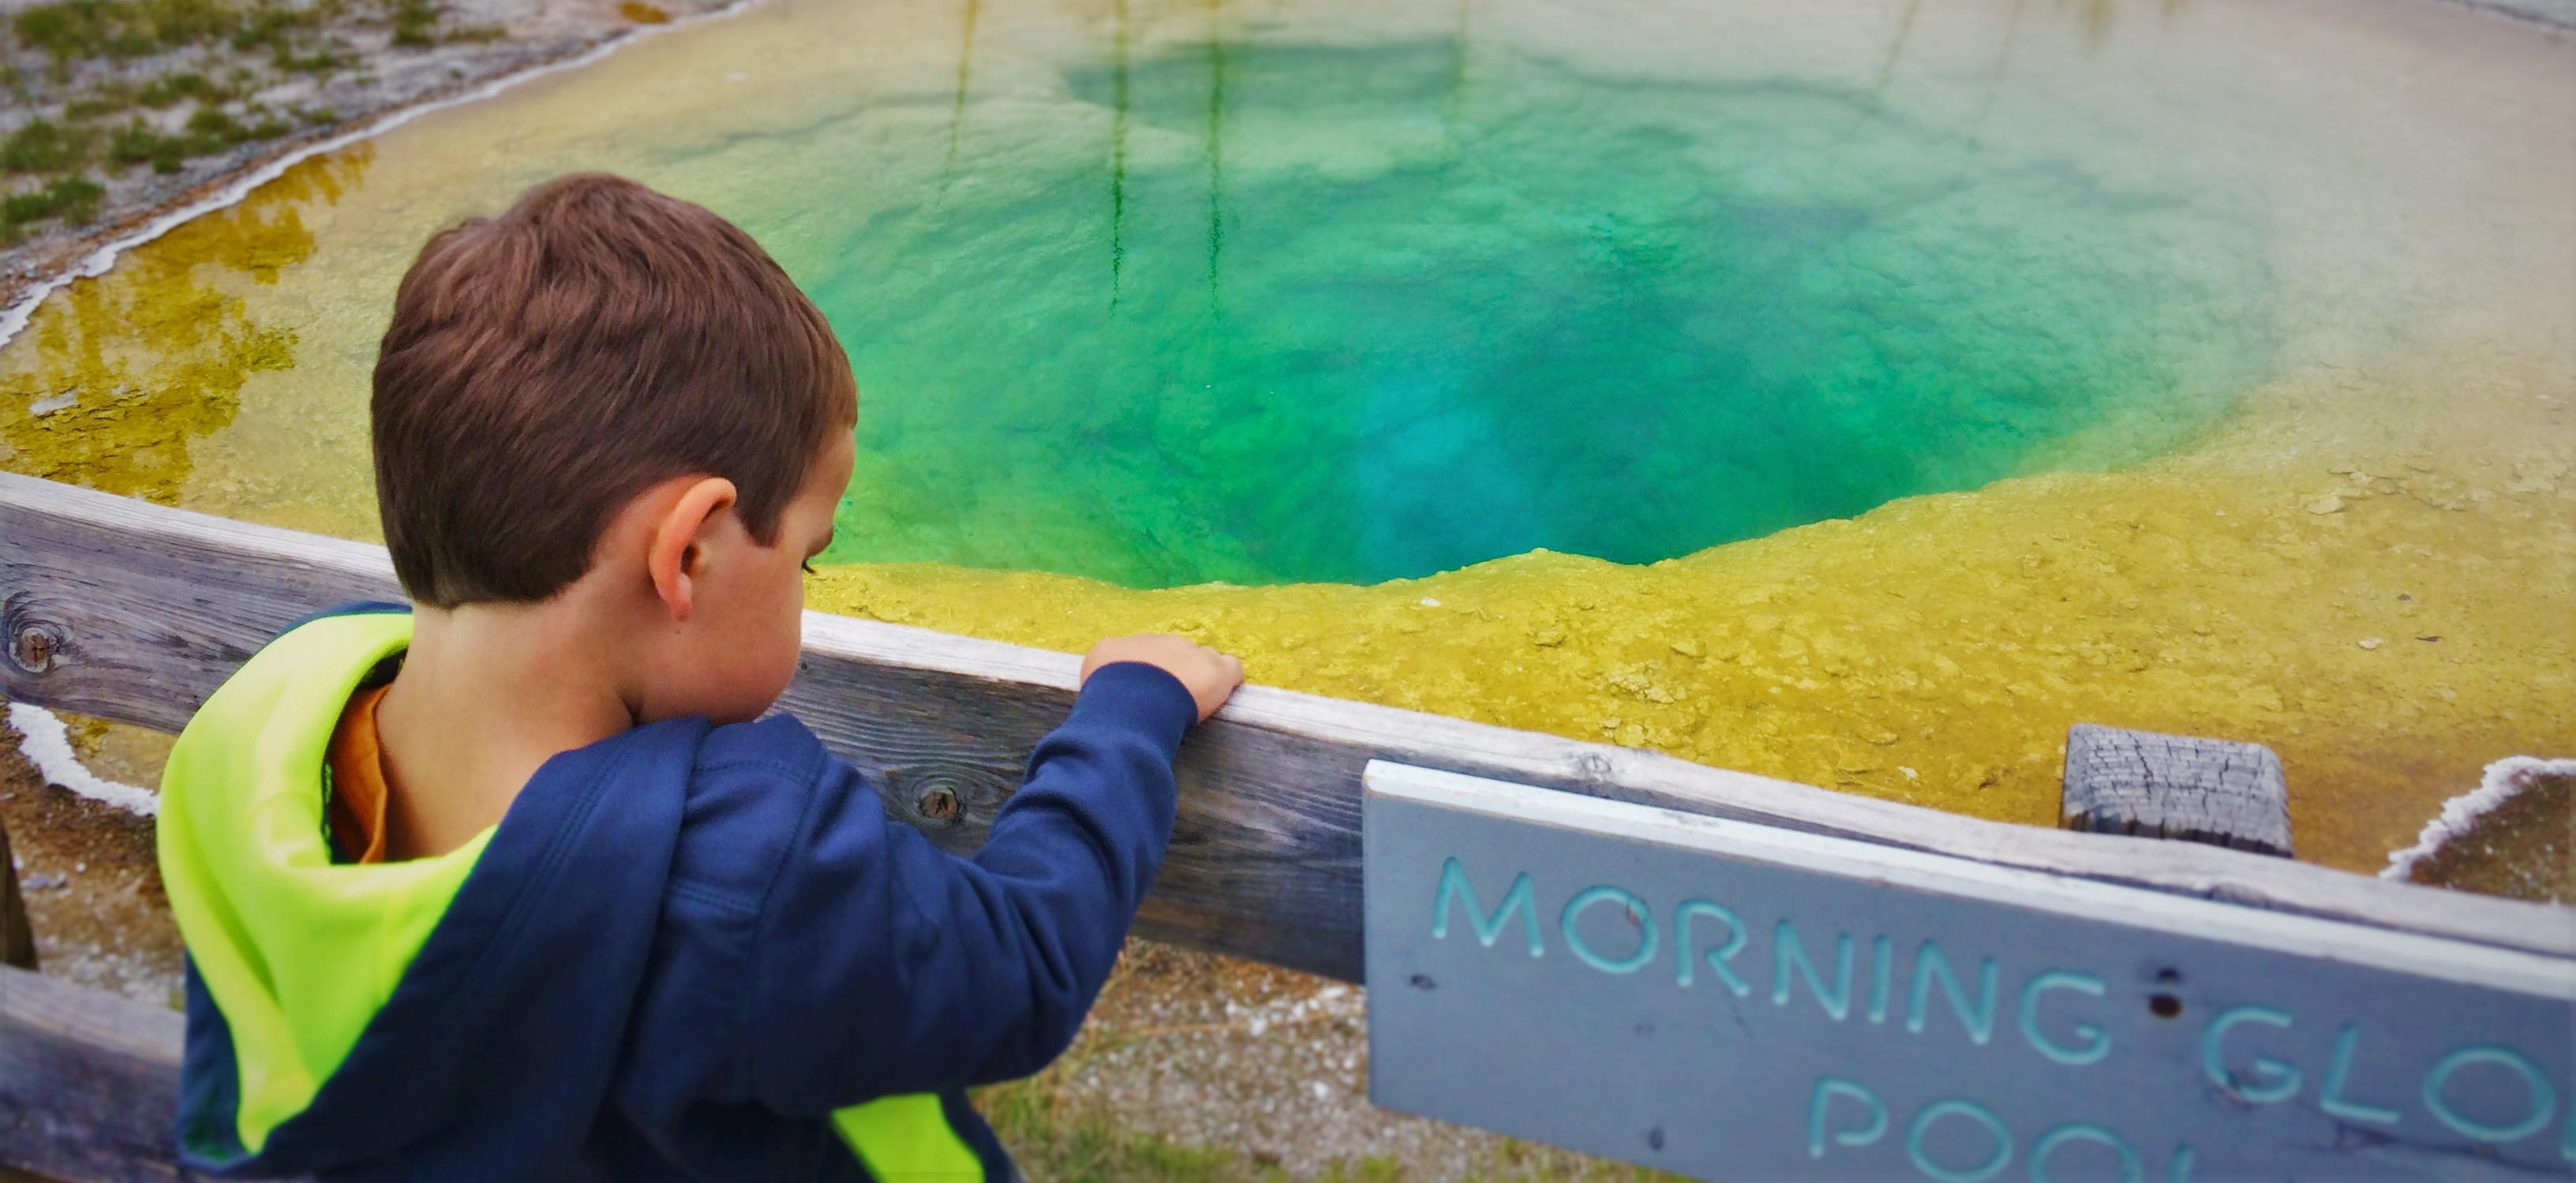 LittleMan with Morning Glory Pool Old Faithful Yellowstone 3 header